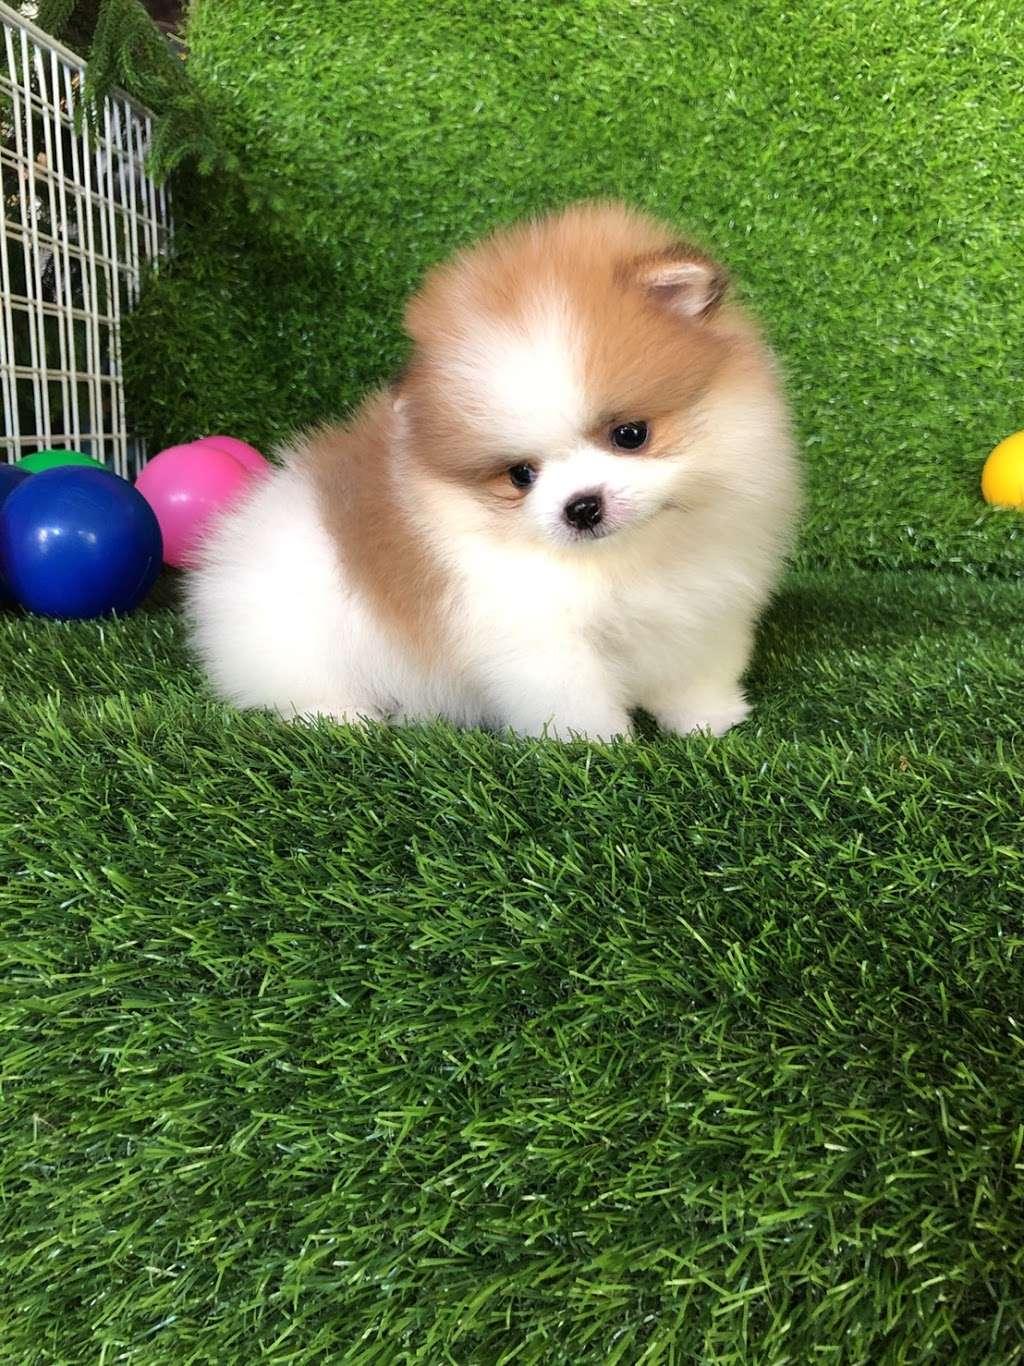 Pomeranian Puppies, Boutique - pet store  | Photo 4 of 10 | Address: Houston, TX, USA | Phone: (650) 303-1599